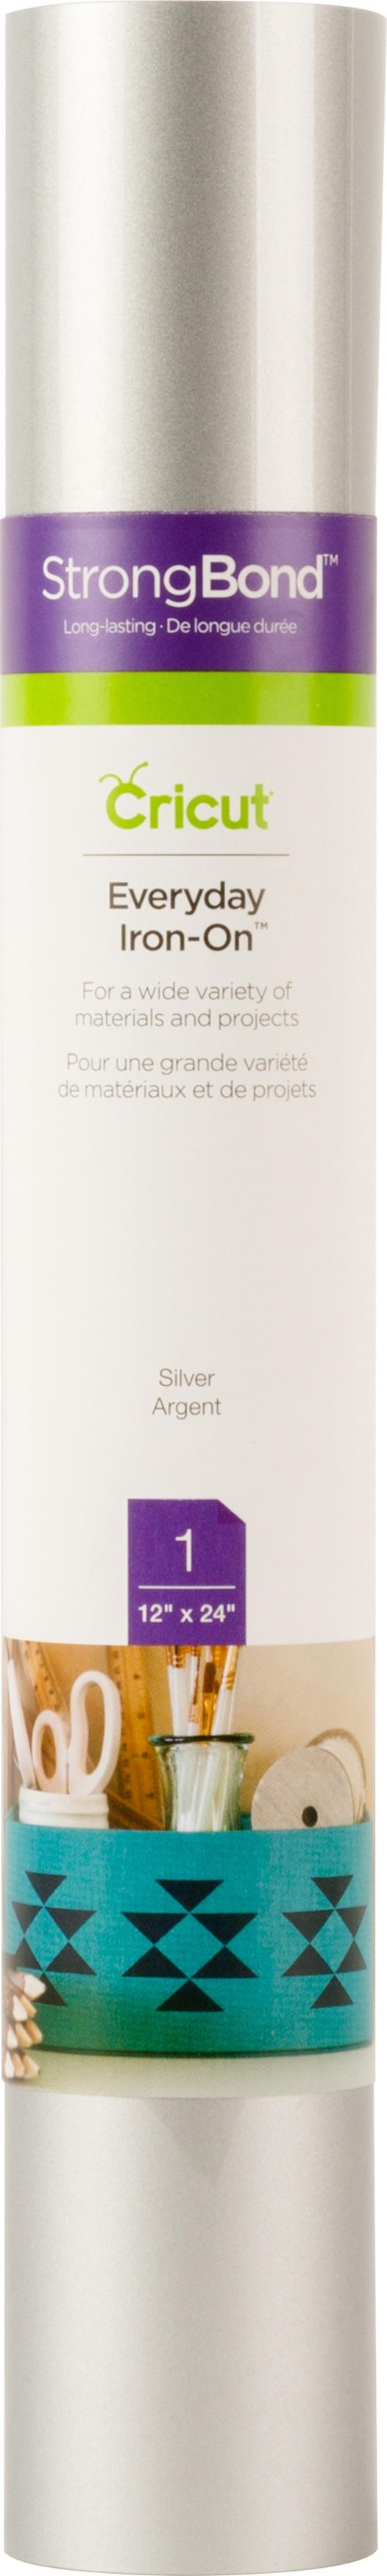 Cricut Everyday Iron On Vinyl 12X24 Roll-Silver